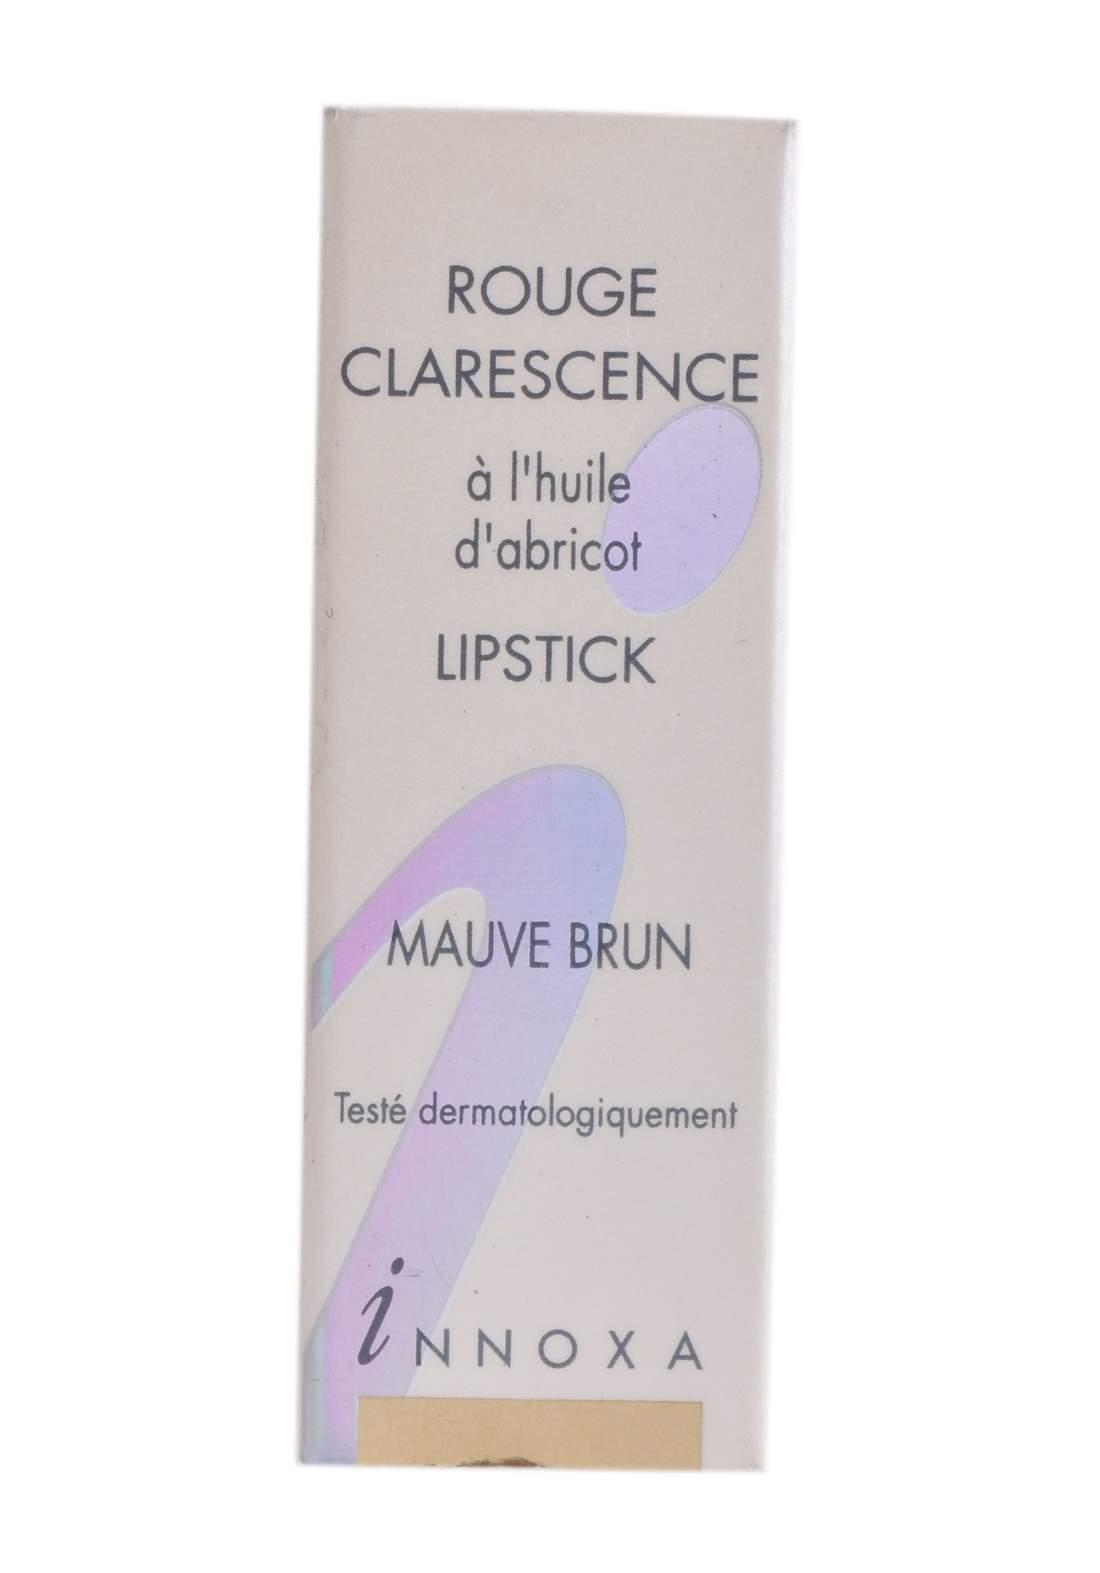 Innoxa Lipstick Rouge Pouge Clarescence -Mauve Brun  احمر شفاه